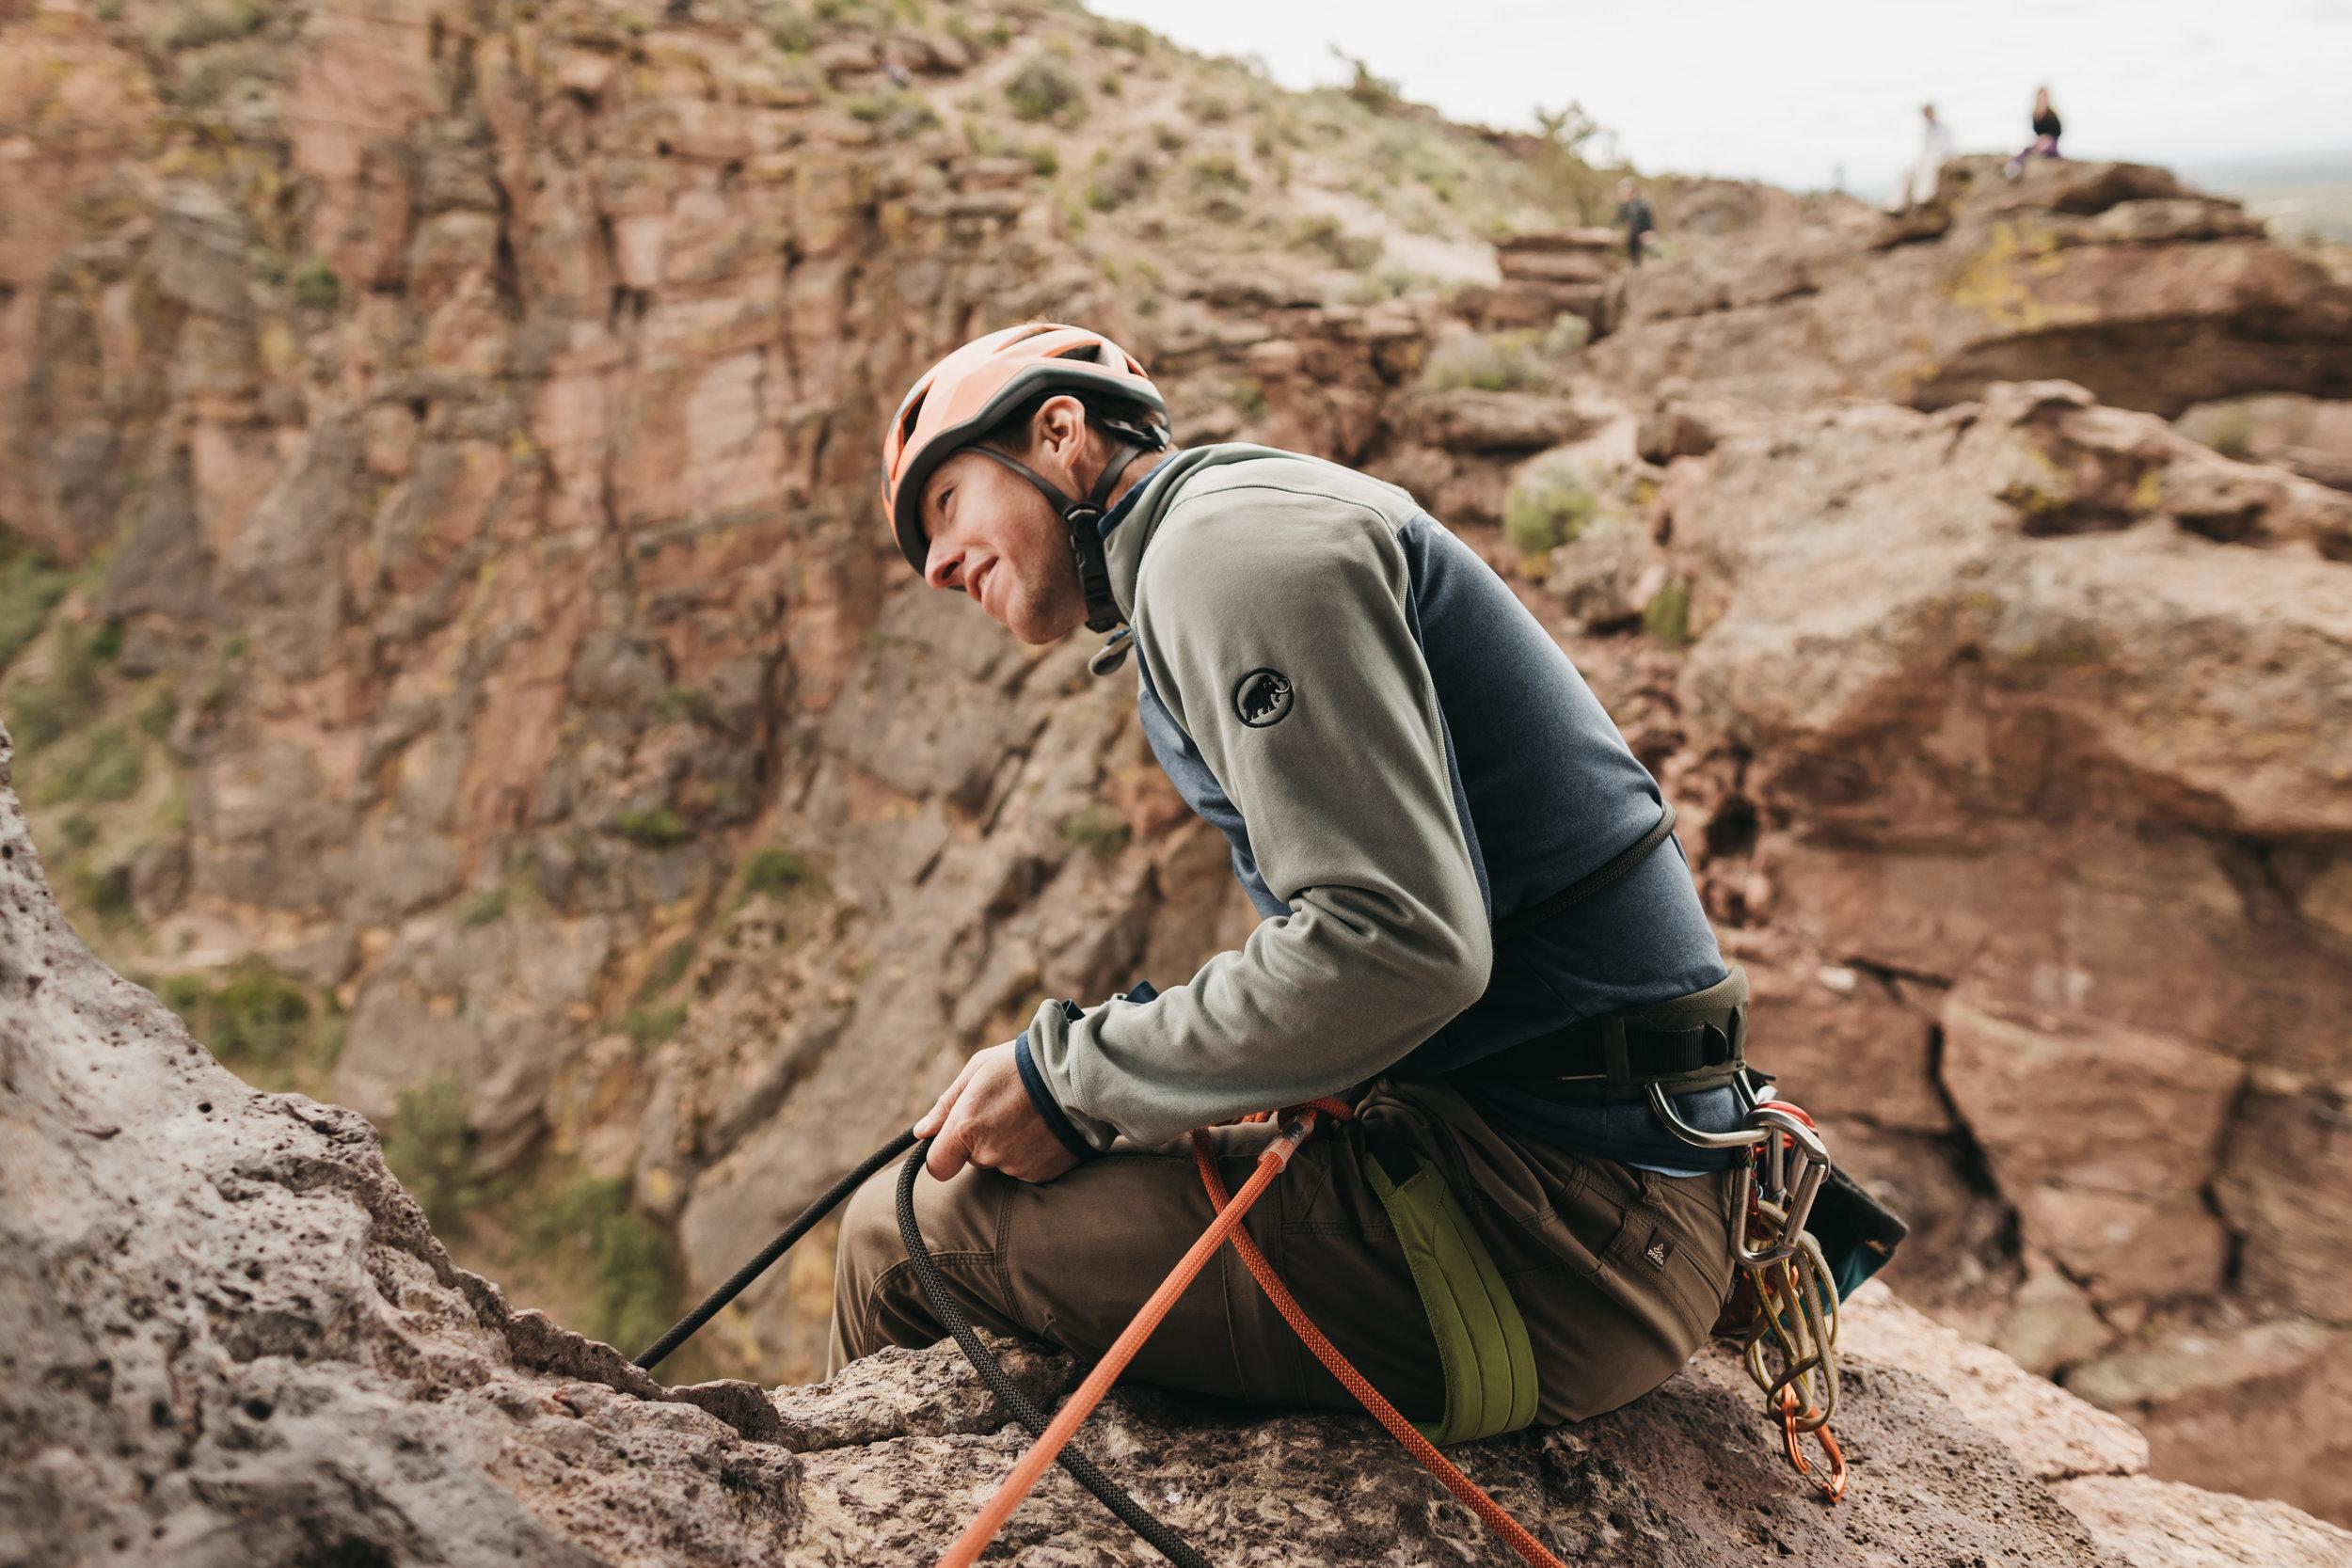 Smith Rock Rock Climbing Elopement | Between the Pine Adventure Elopement Photography